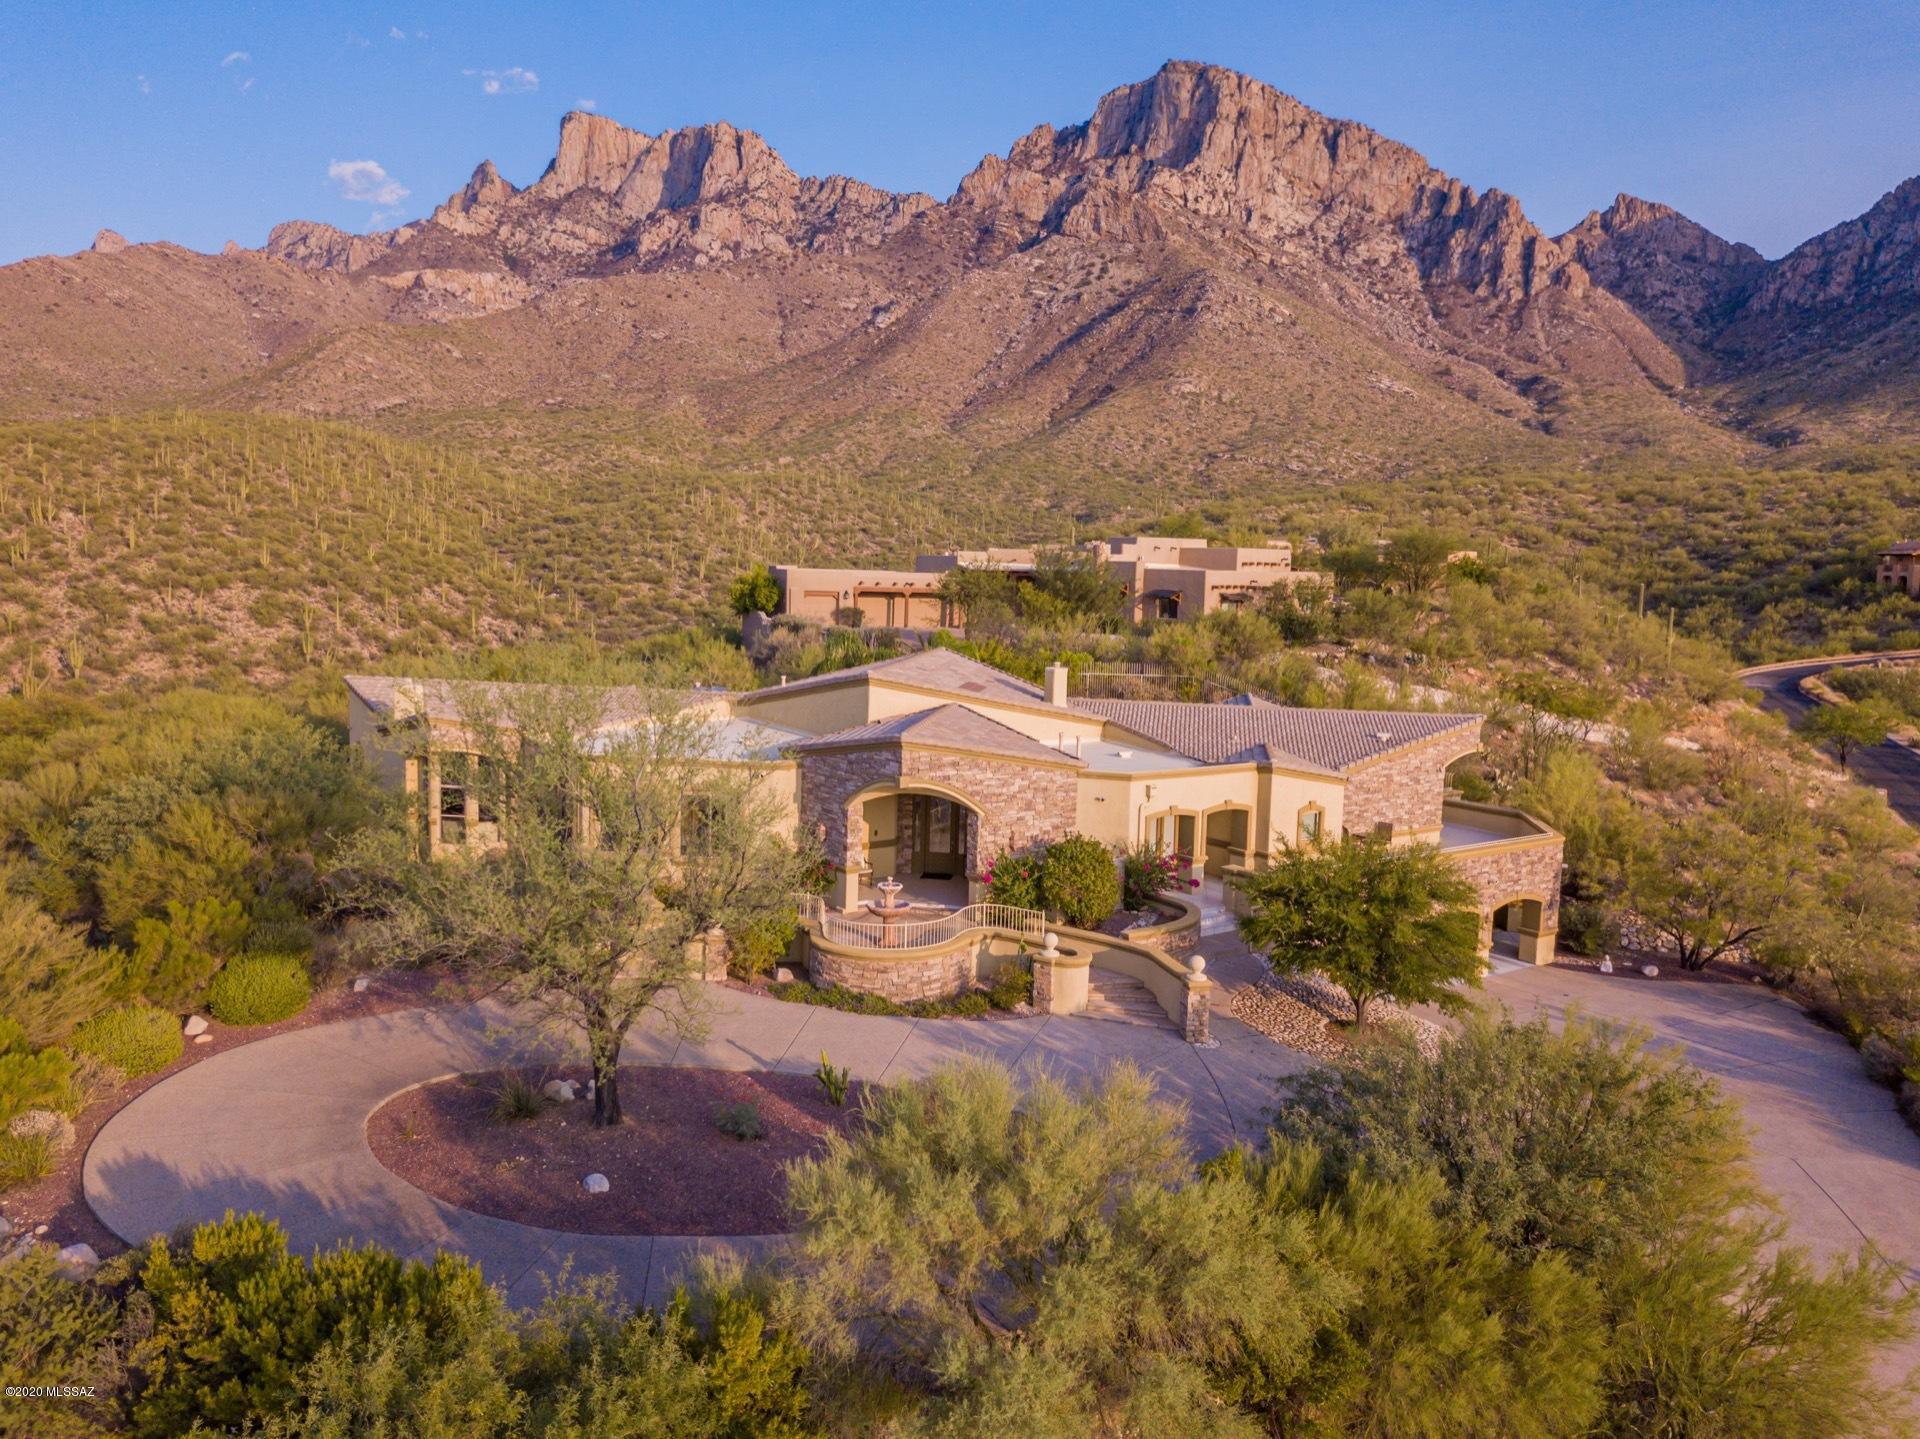 Photo of 10310 N Cliff Dweller Place, Oro Valley, AZ 85737